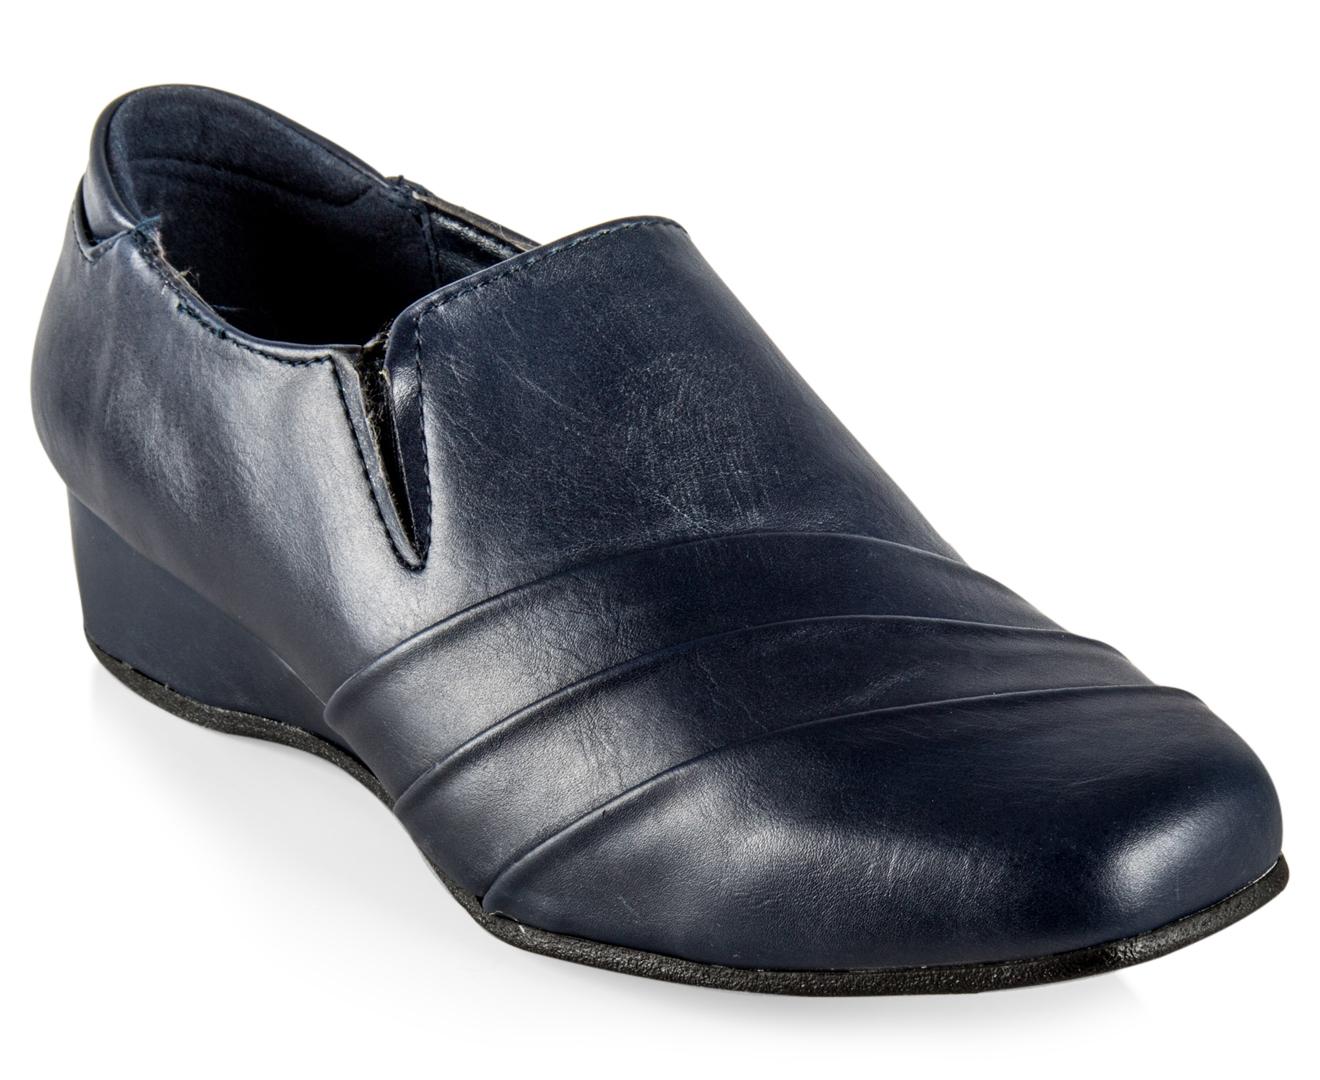 Grosby Shoes Australia